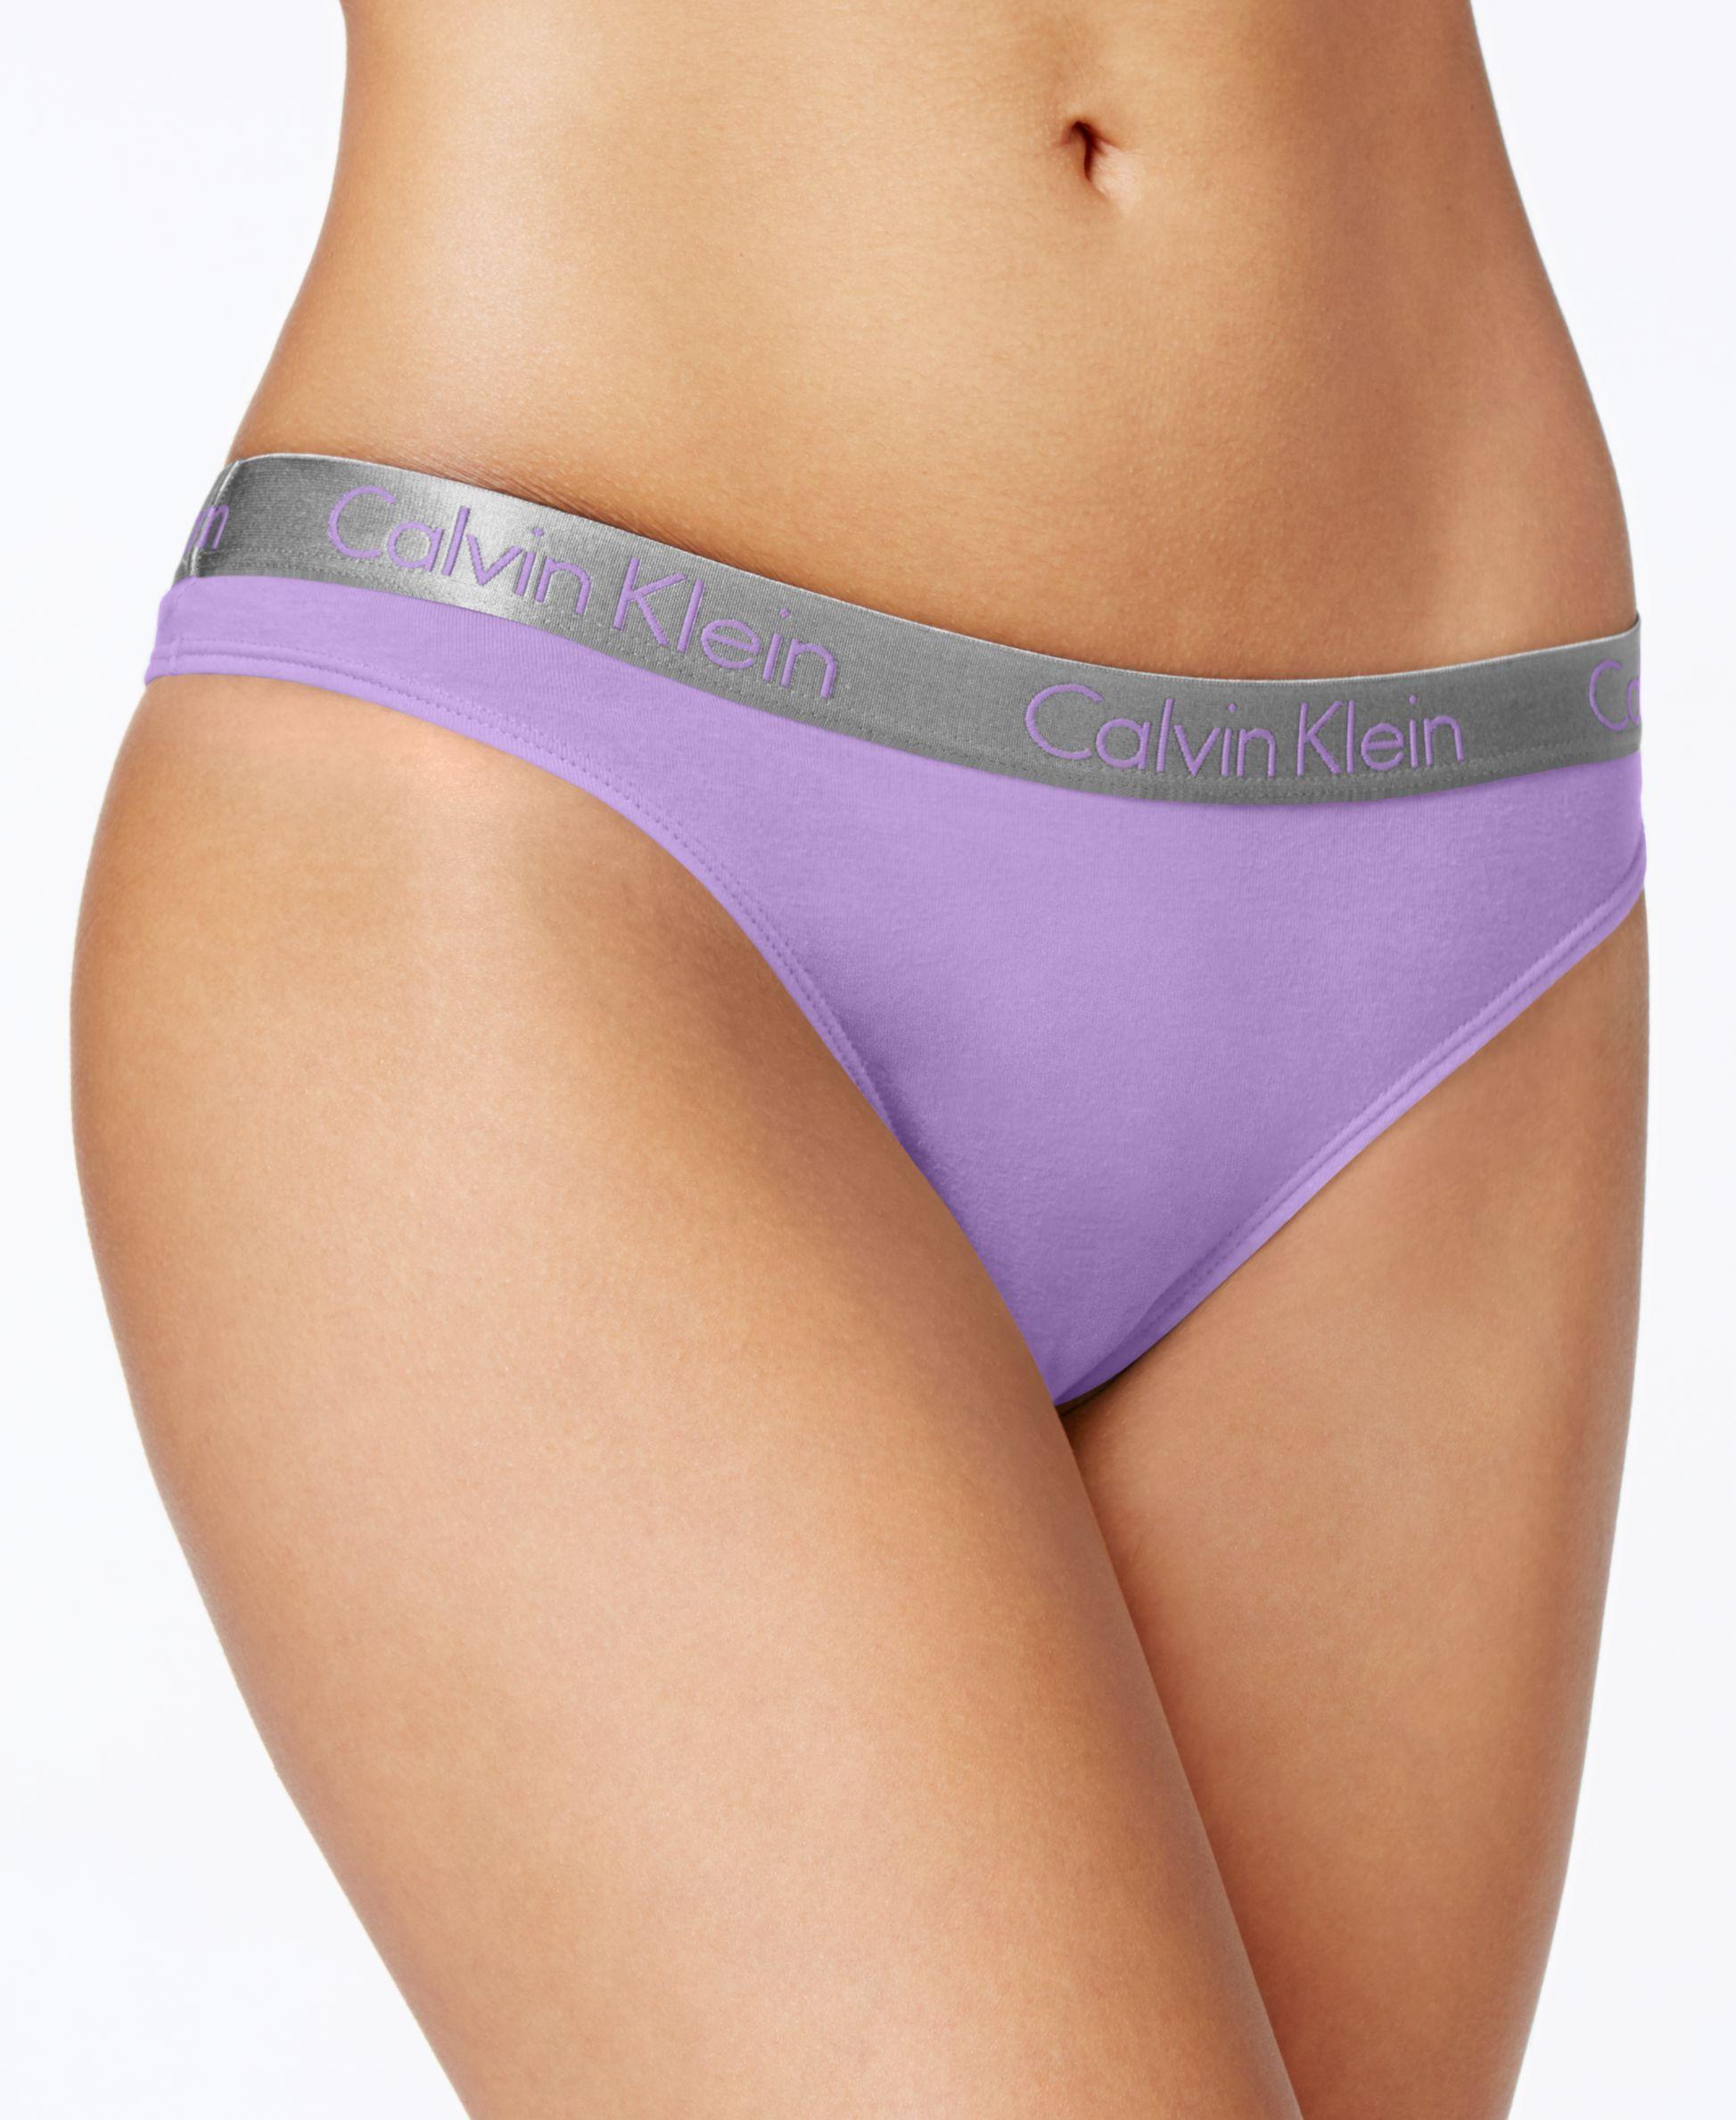 Calvin klein signature logo bikini sale opinion you